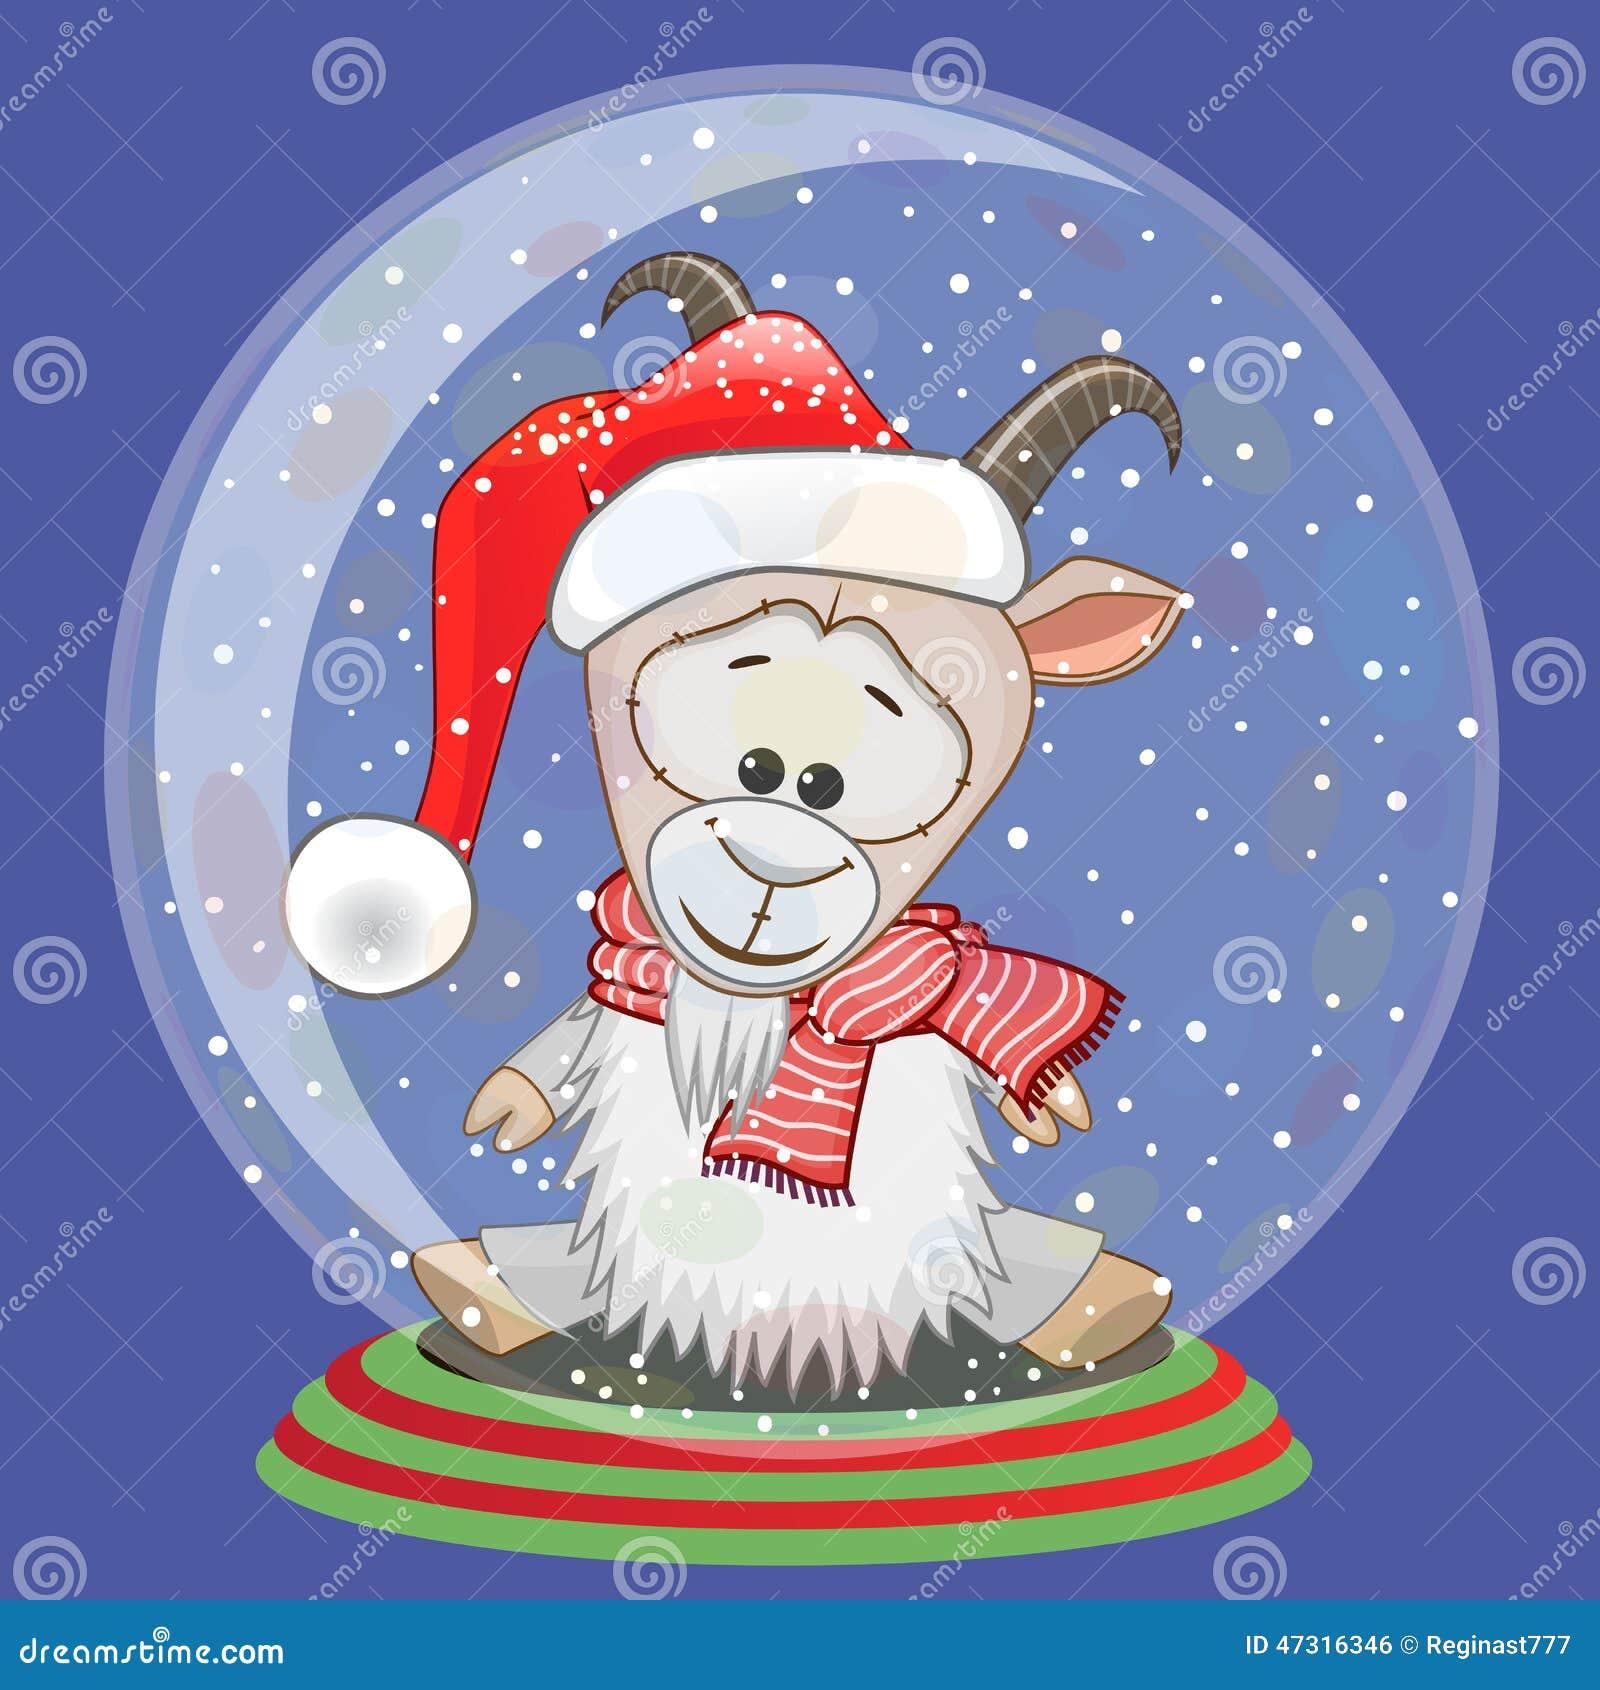 Santa Goat stock vector. Illustration of cheerful 5349bfd218c7